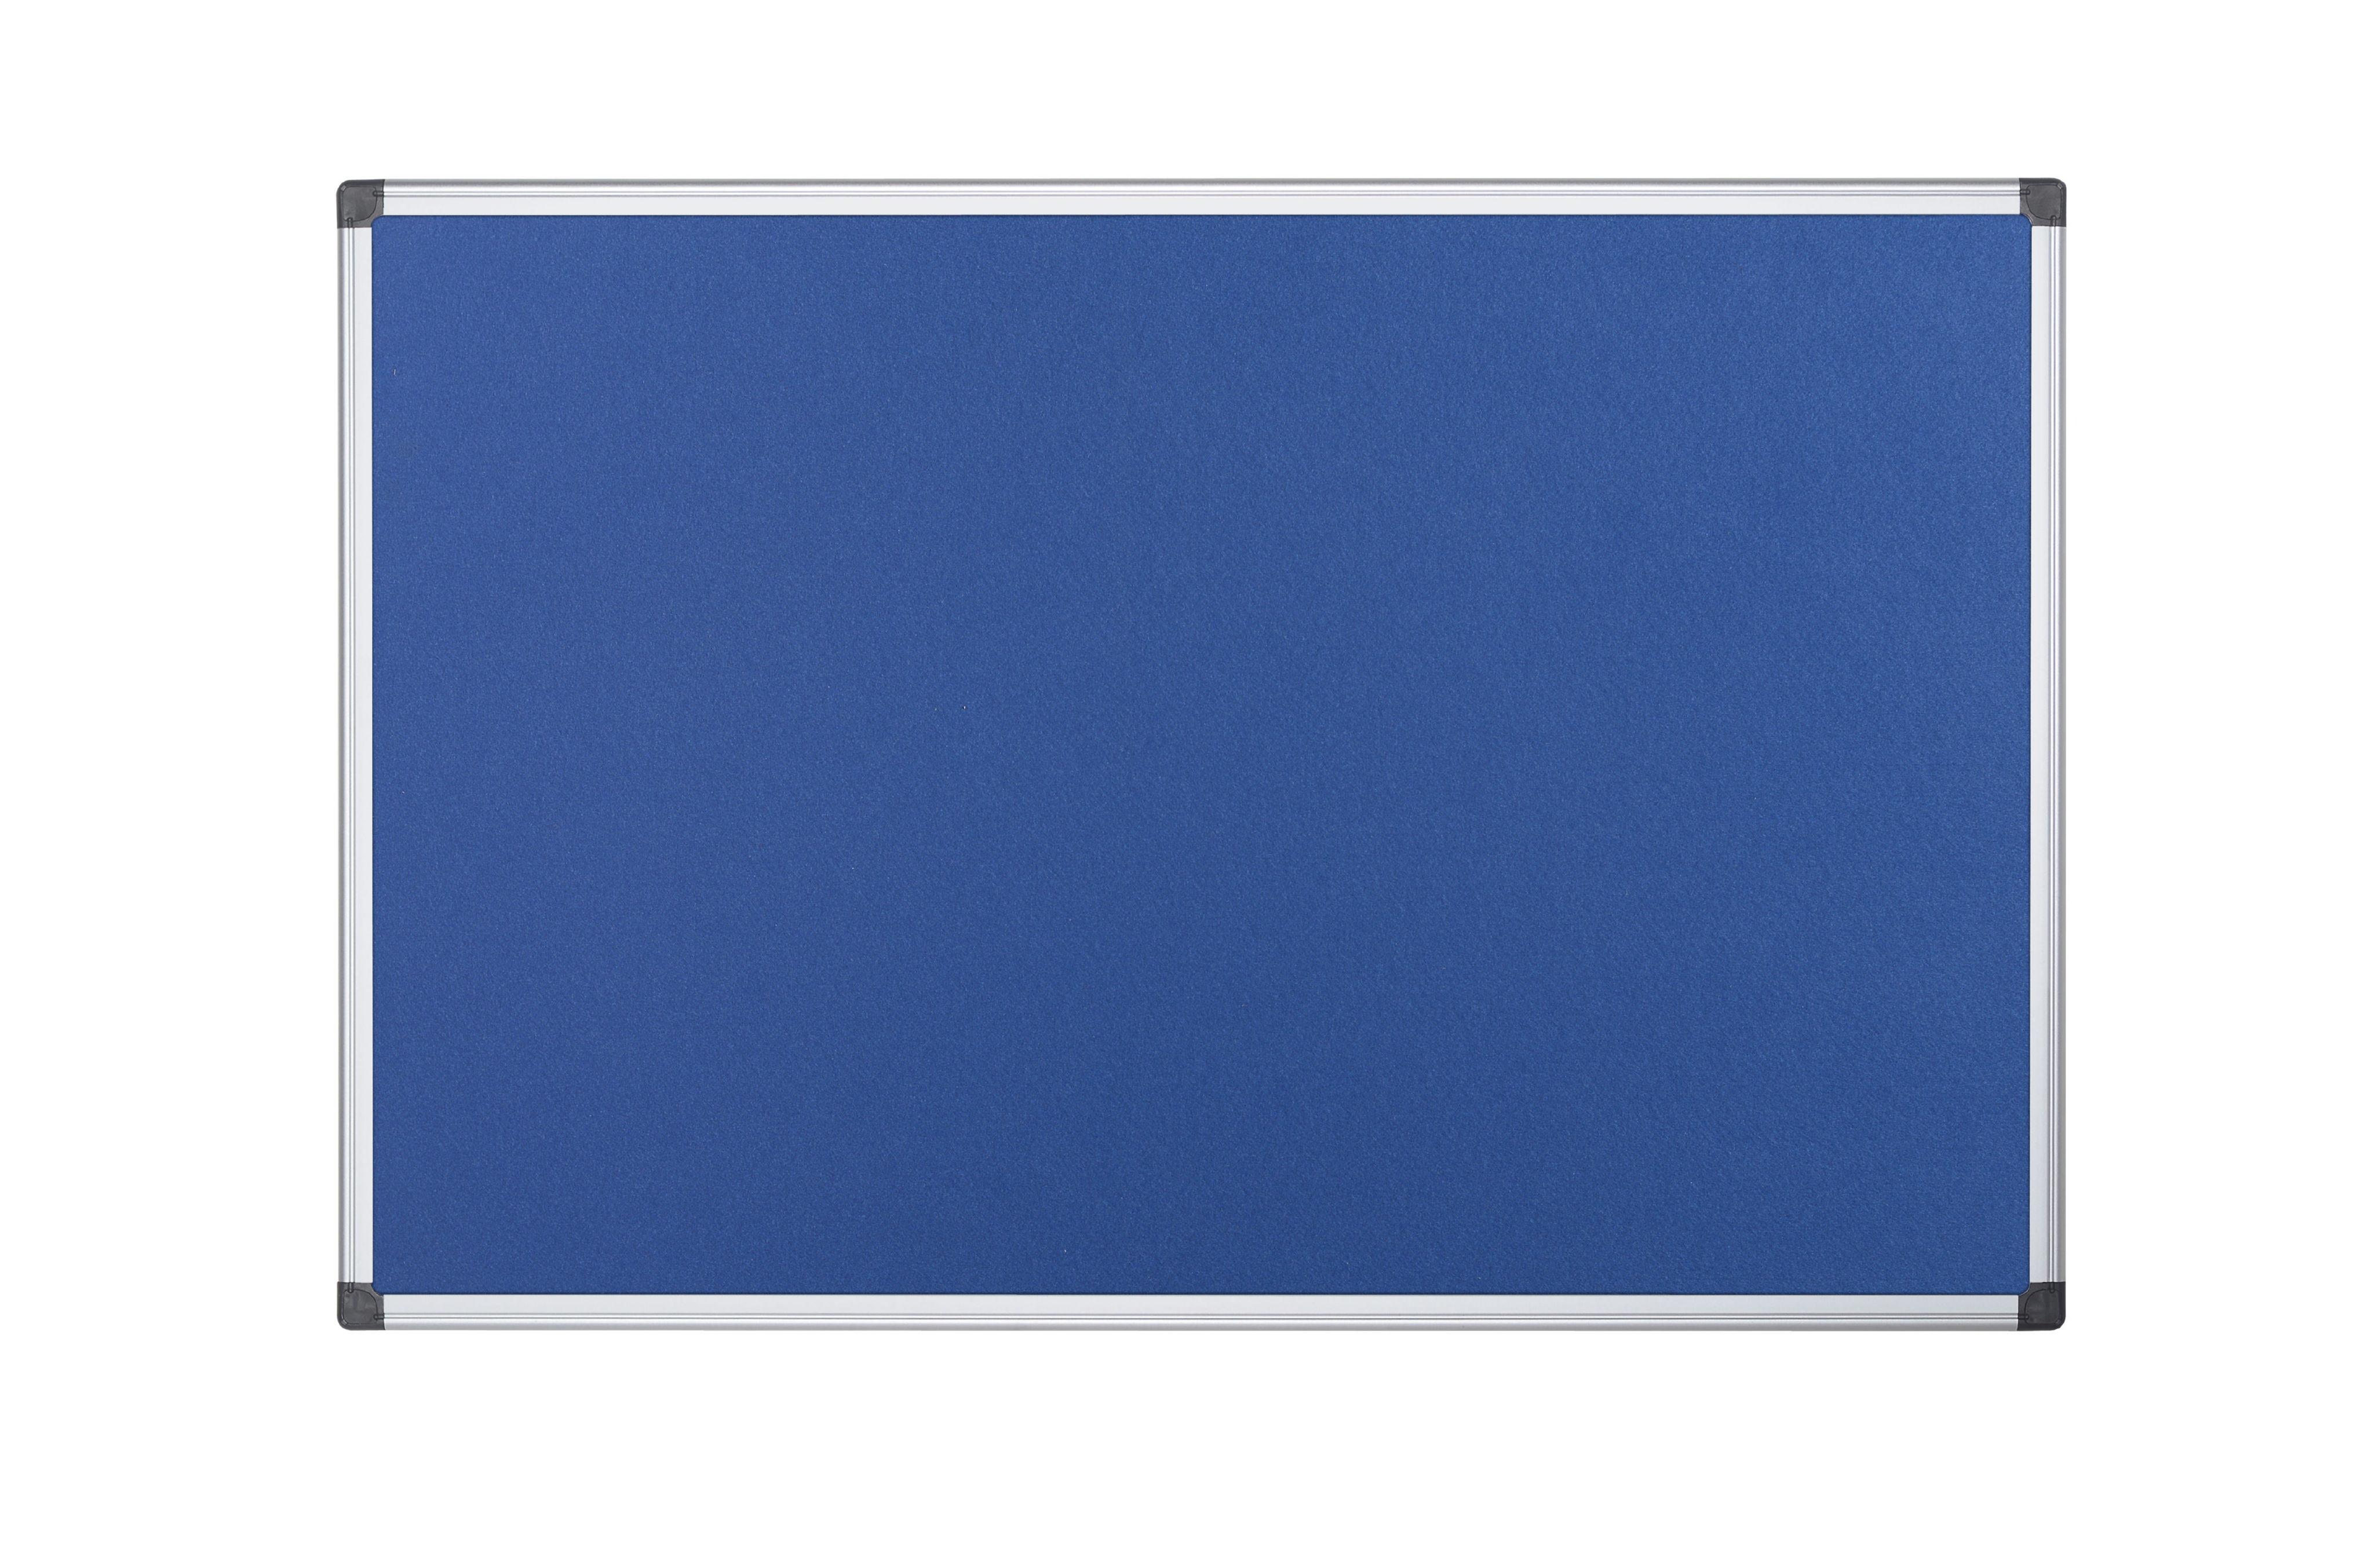 Felt Bi-Office Maya Blue Felt Ntcbrd Alu Frame 150x120cm